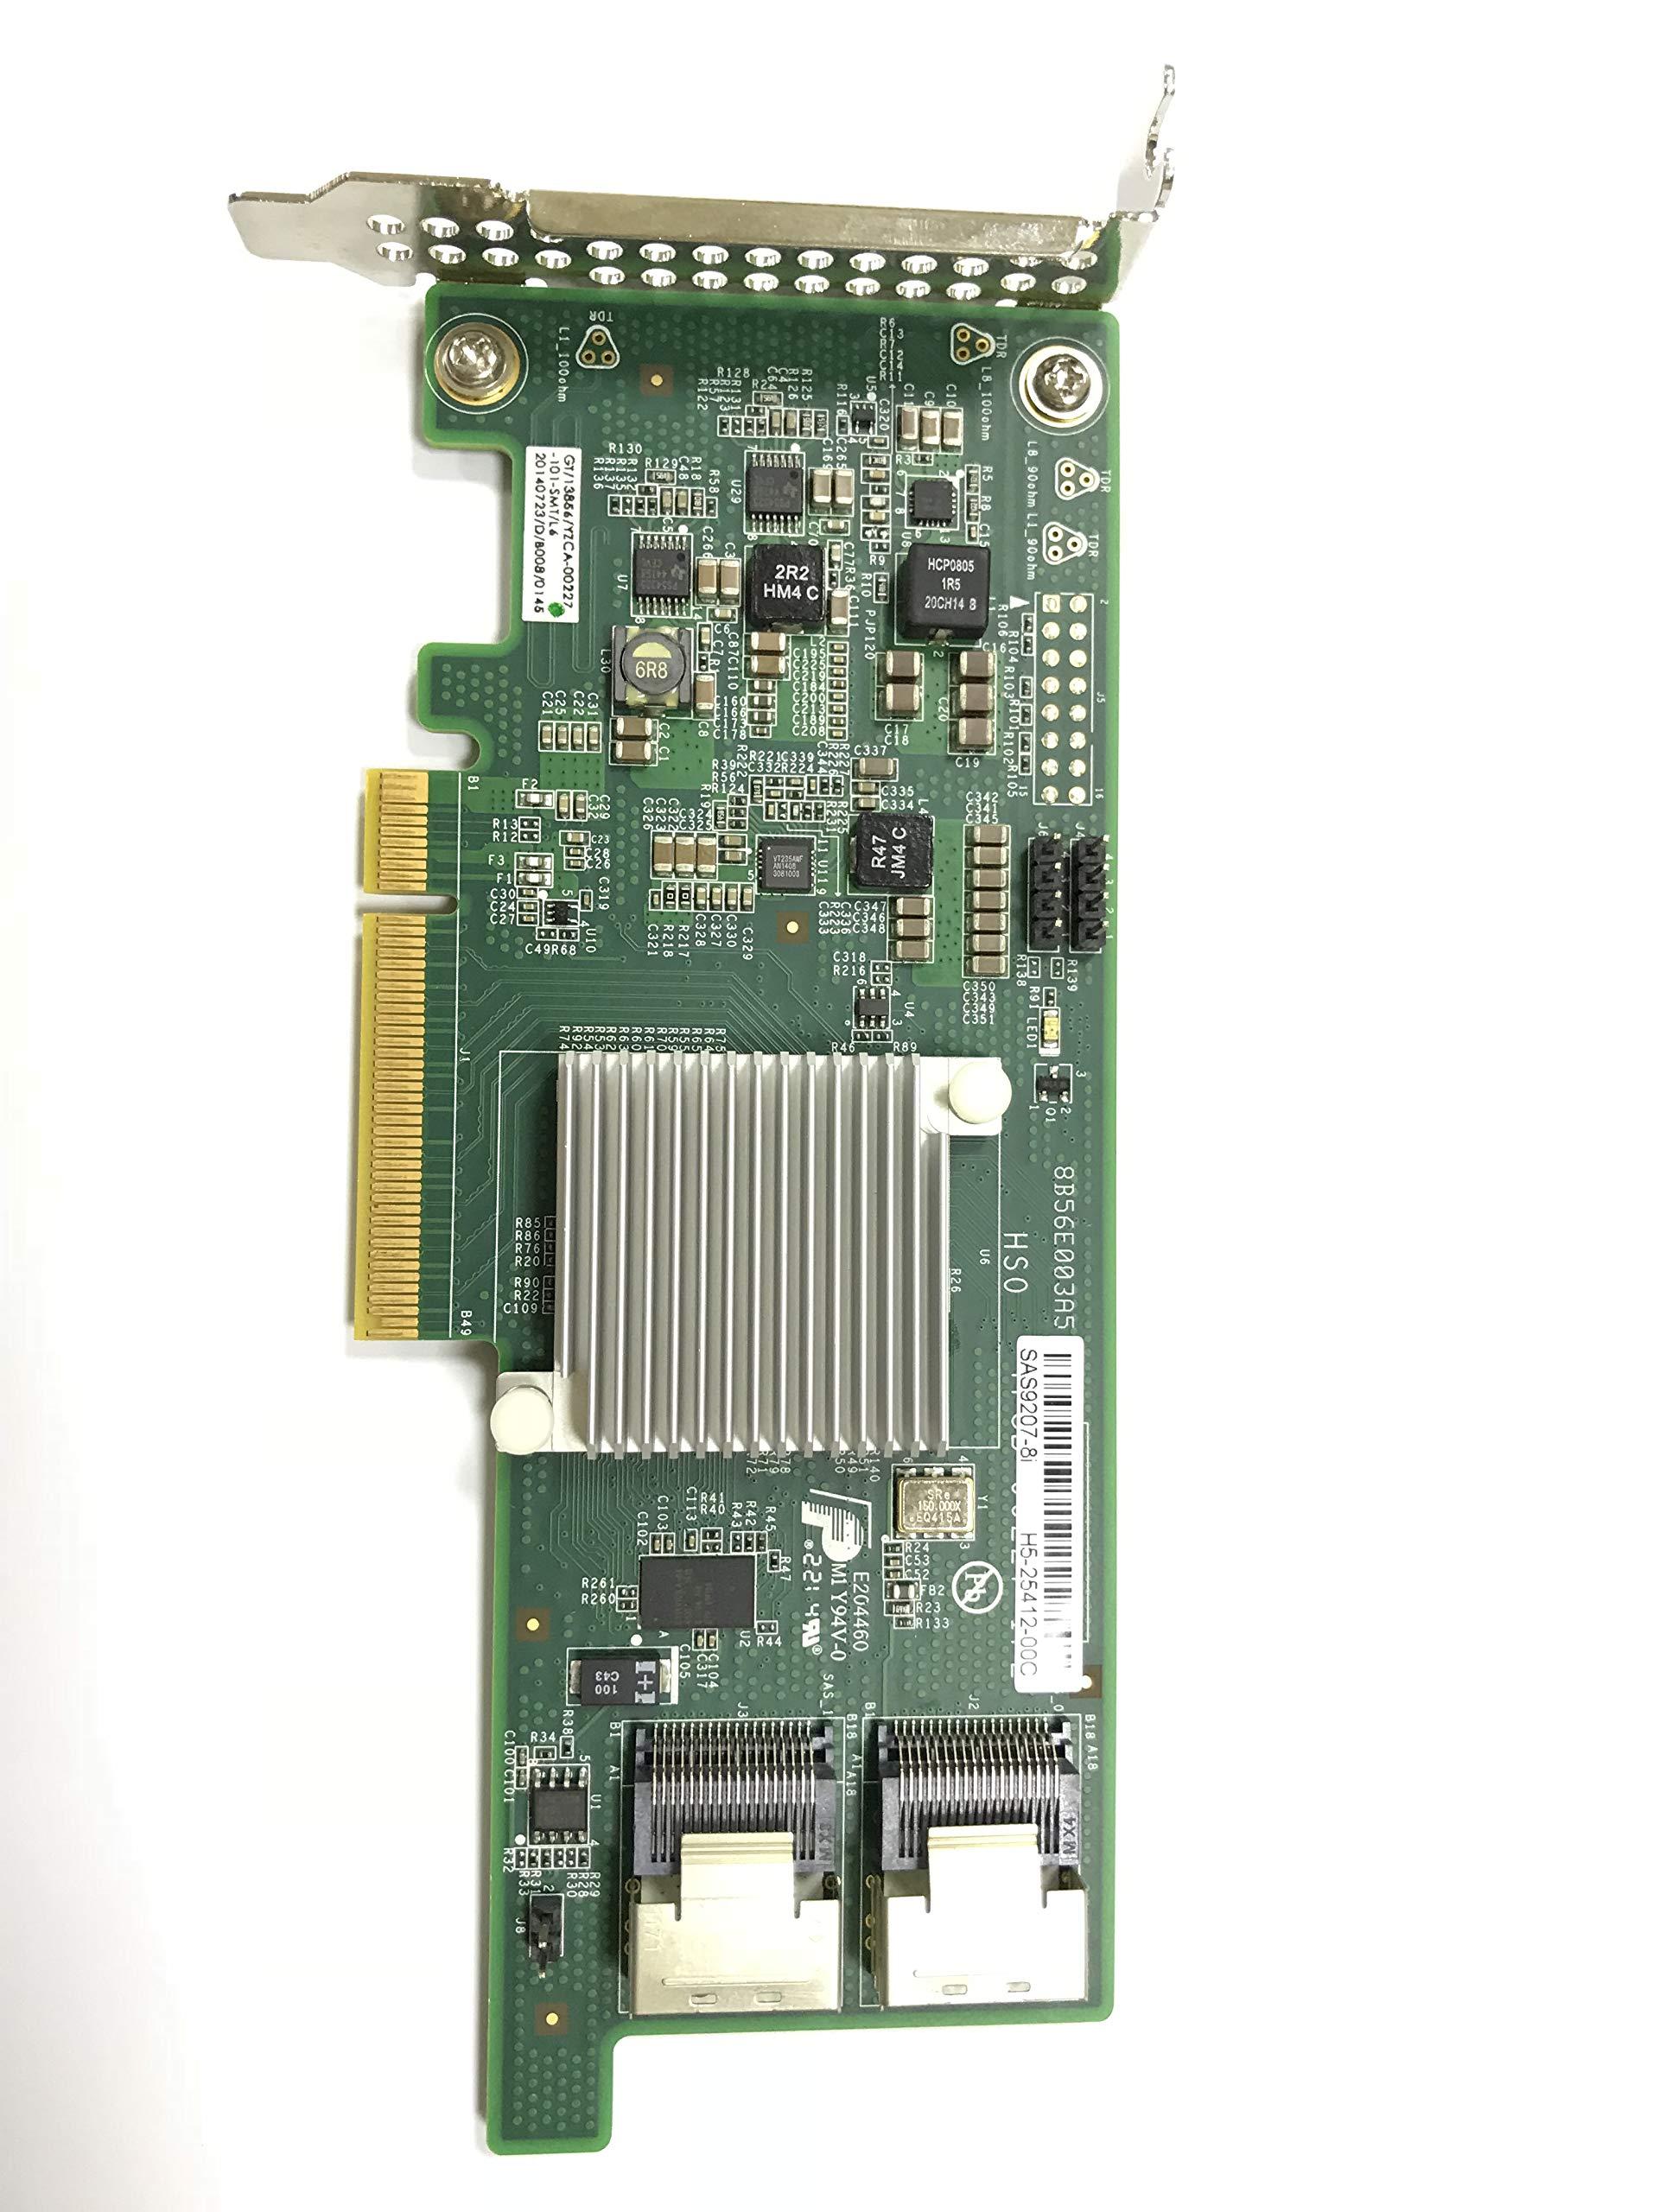 MFU SAS 9207-8i 8-Port 6Gb/s SAS+SATA to PCI Express 2.0 Host Bus Adapter by MFU